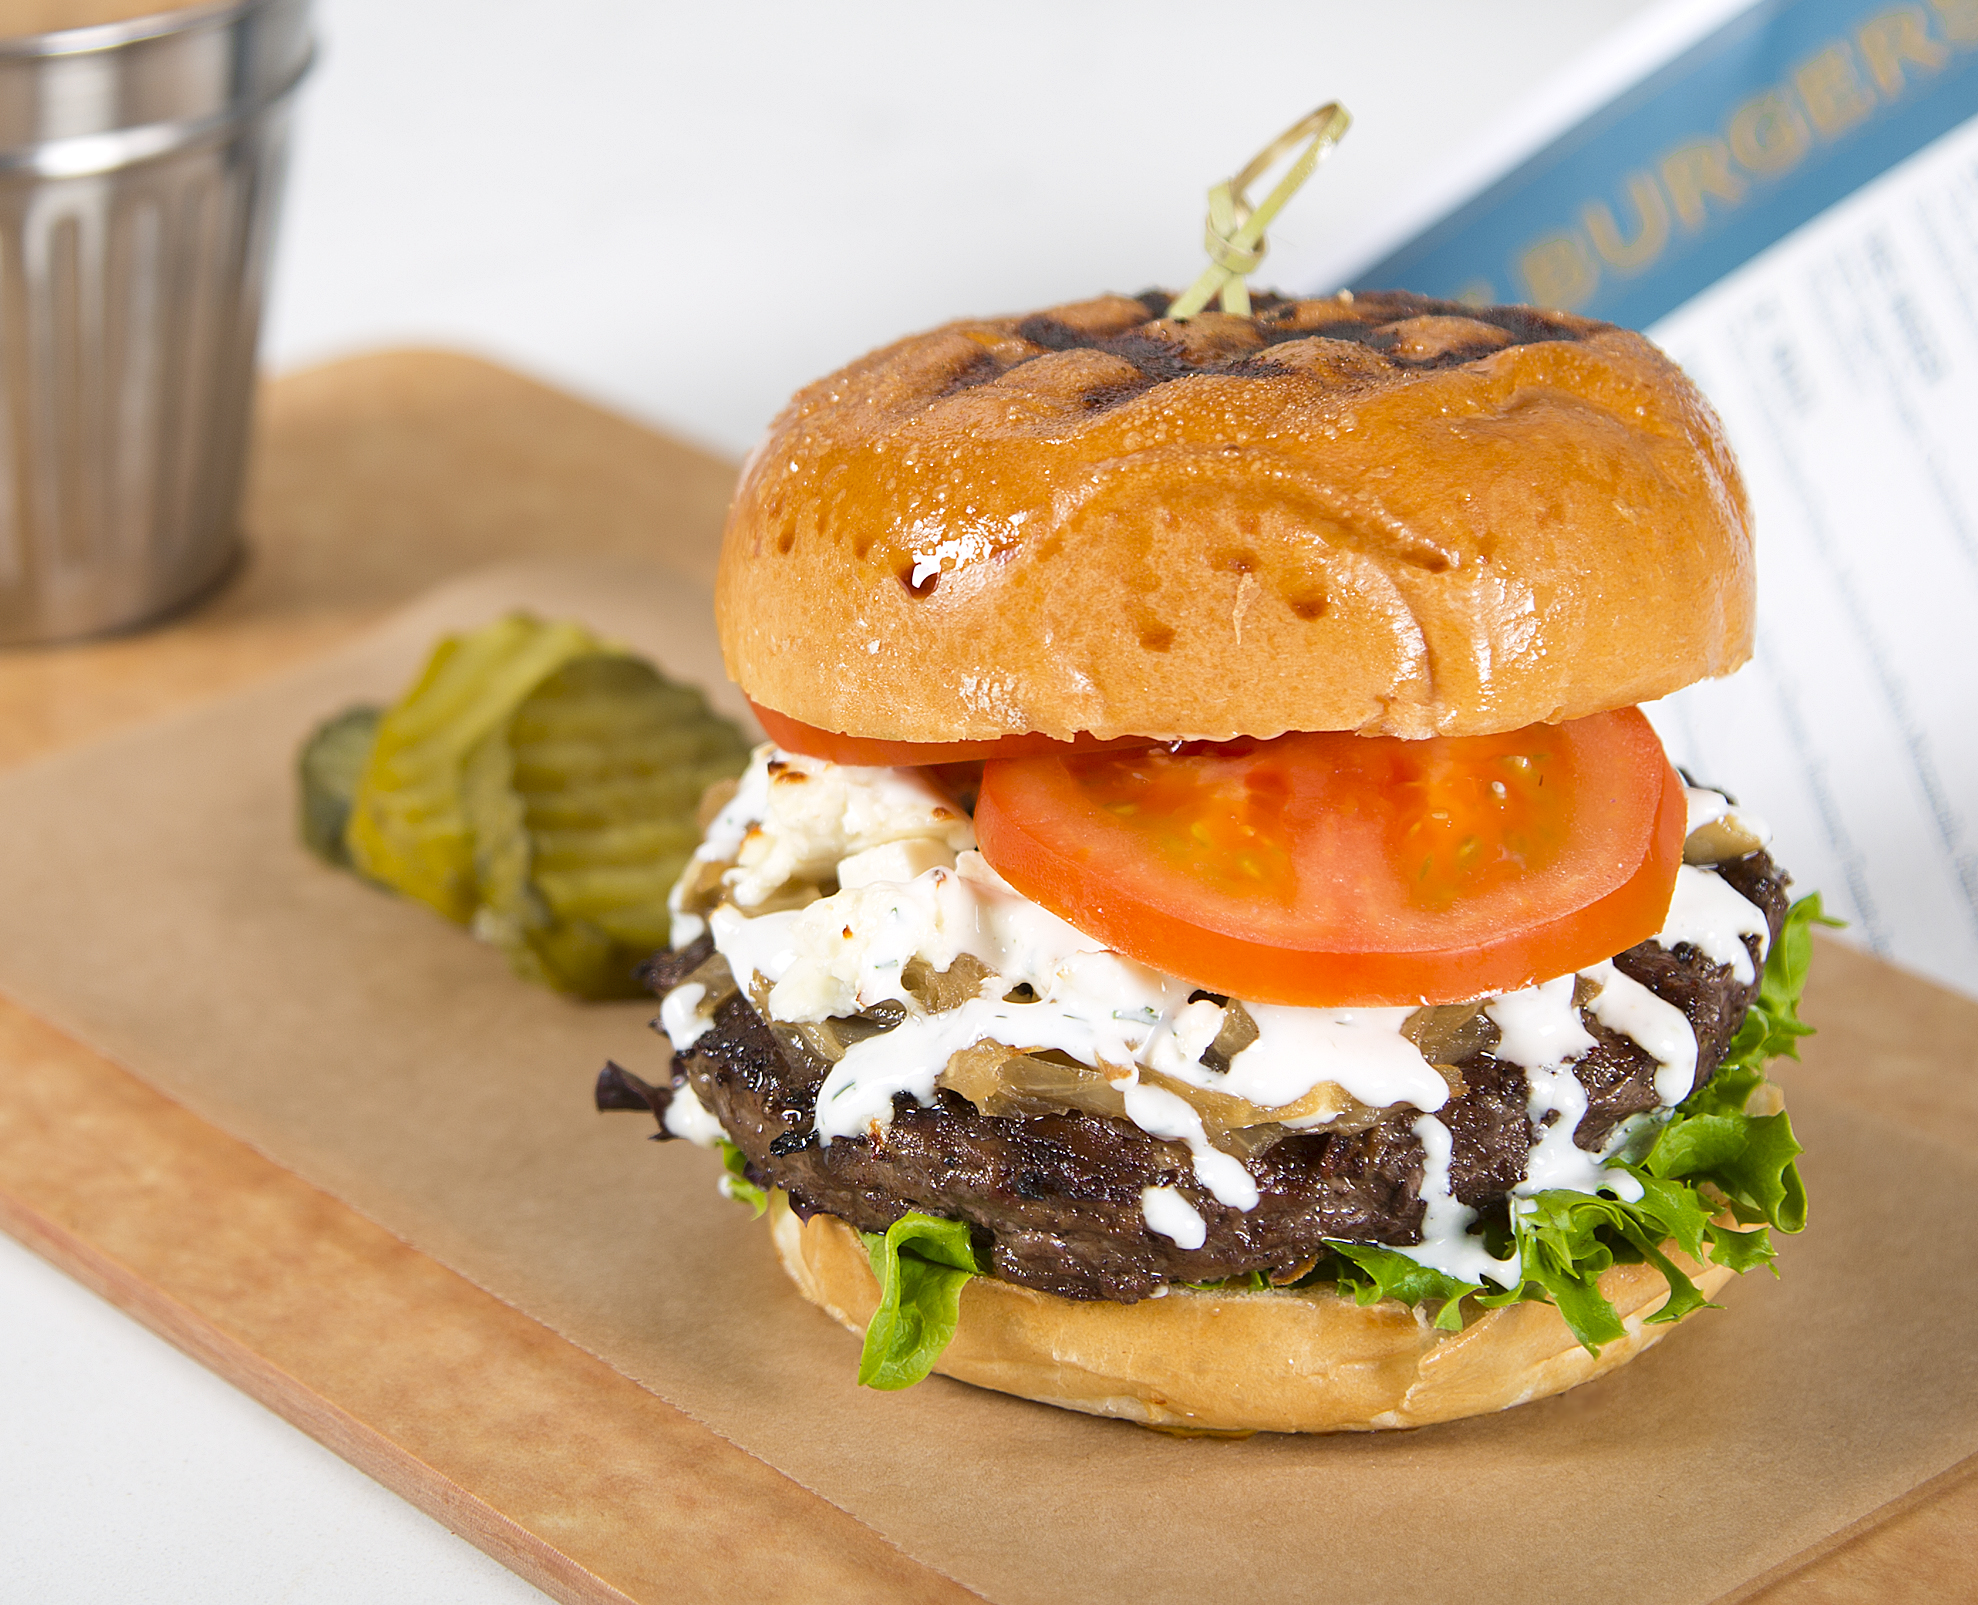 LITTLE BO PEEP   Spiced Artisan Lamb Burger, Caramelized Onions, Aged Feta Cheese, Field Greens, Florida Tomato, Tzatziki Sauce, Pita Round